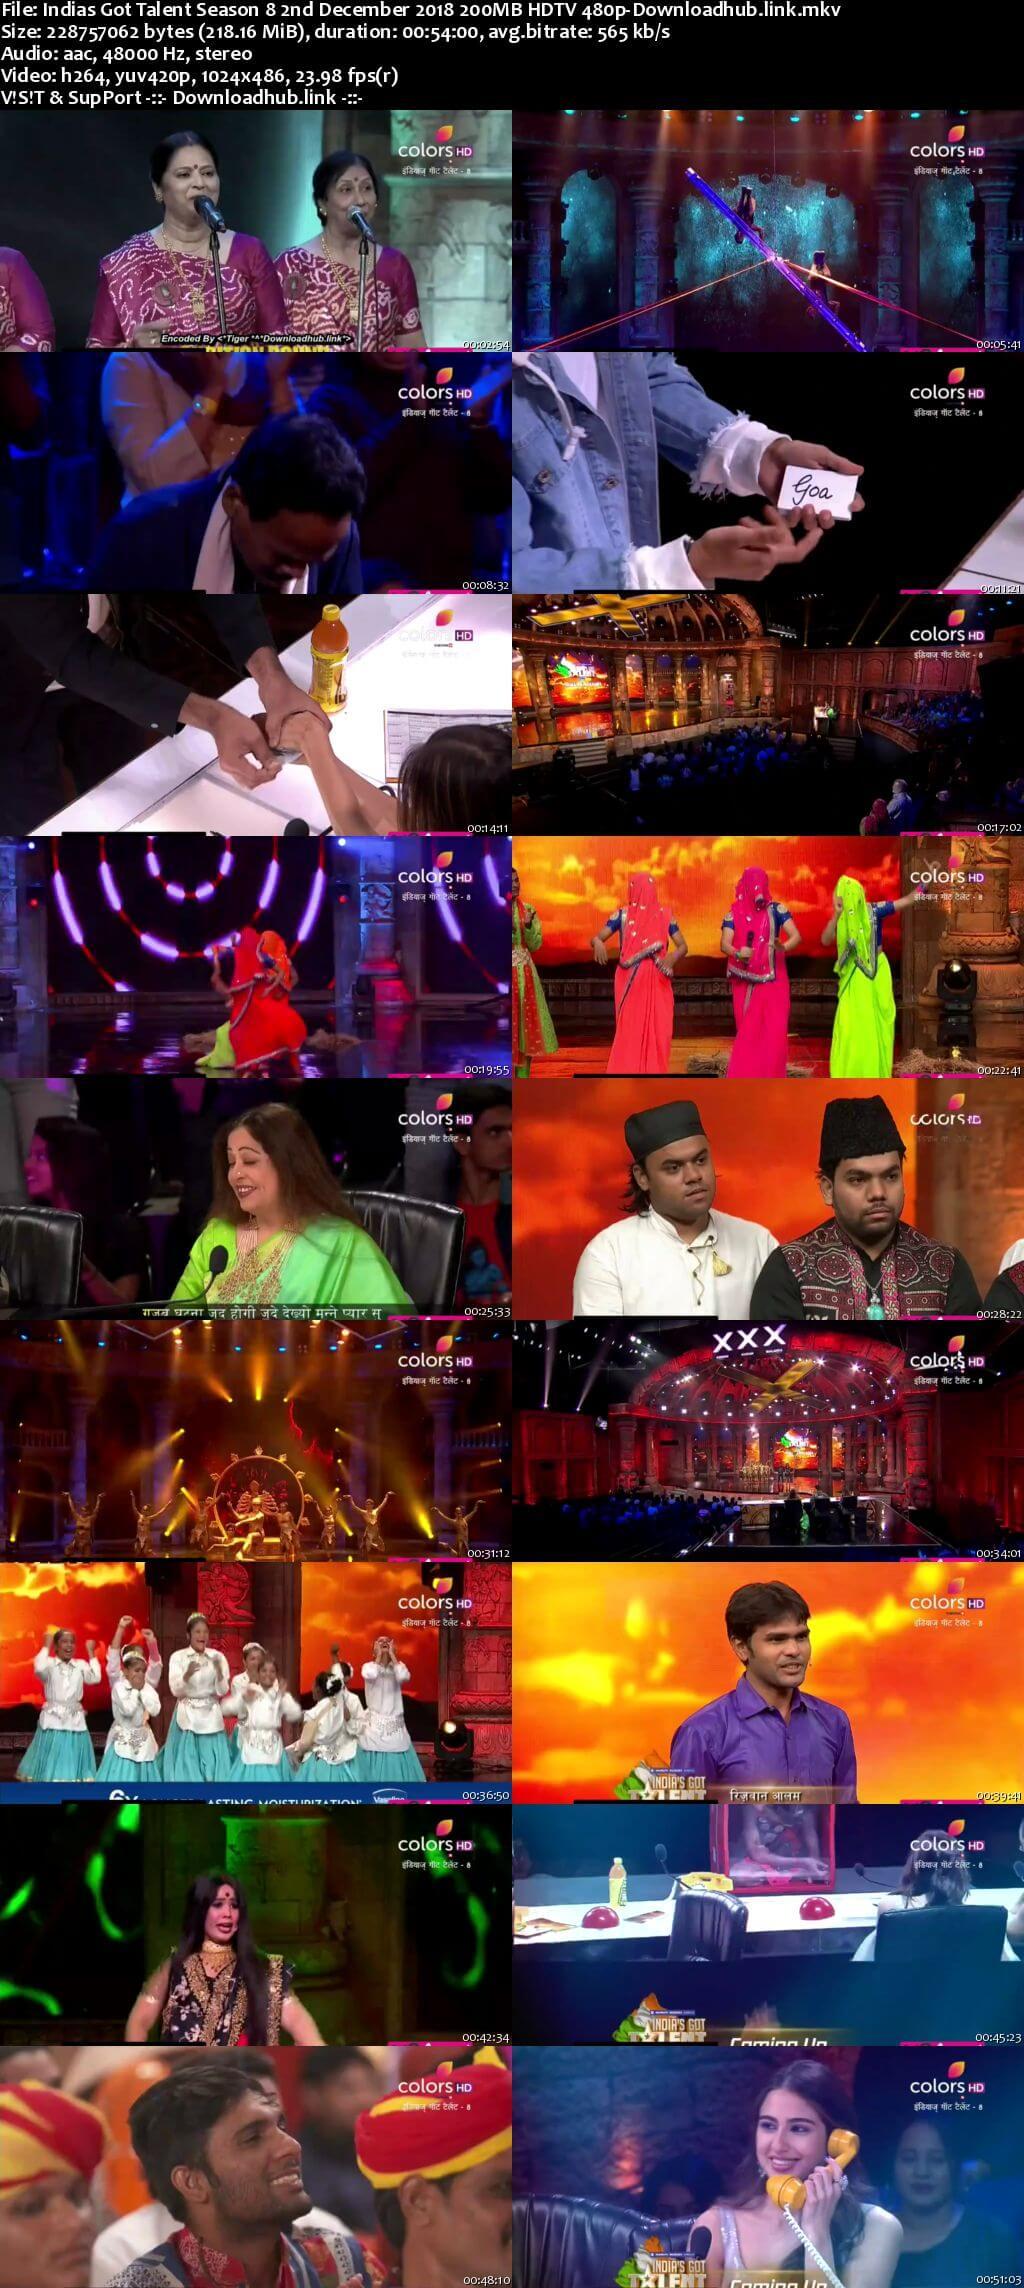 Indias Got Talent Season 8 02 December 2018 Episode 14 HDTV 480p